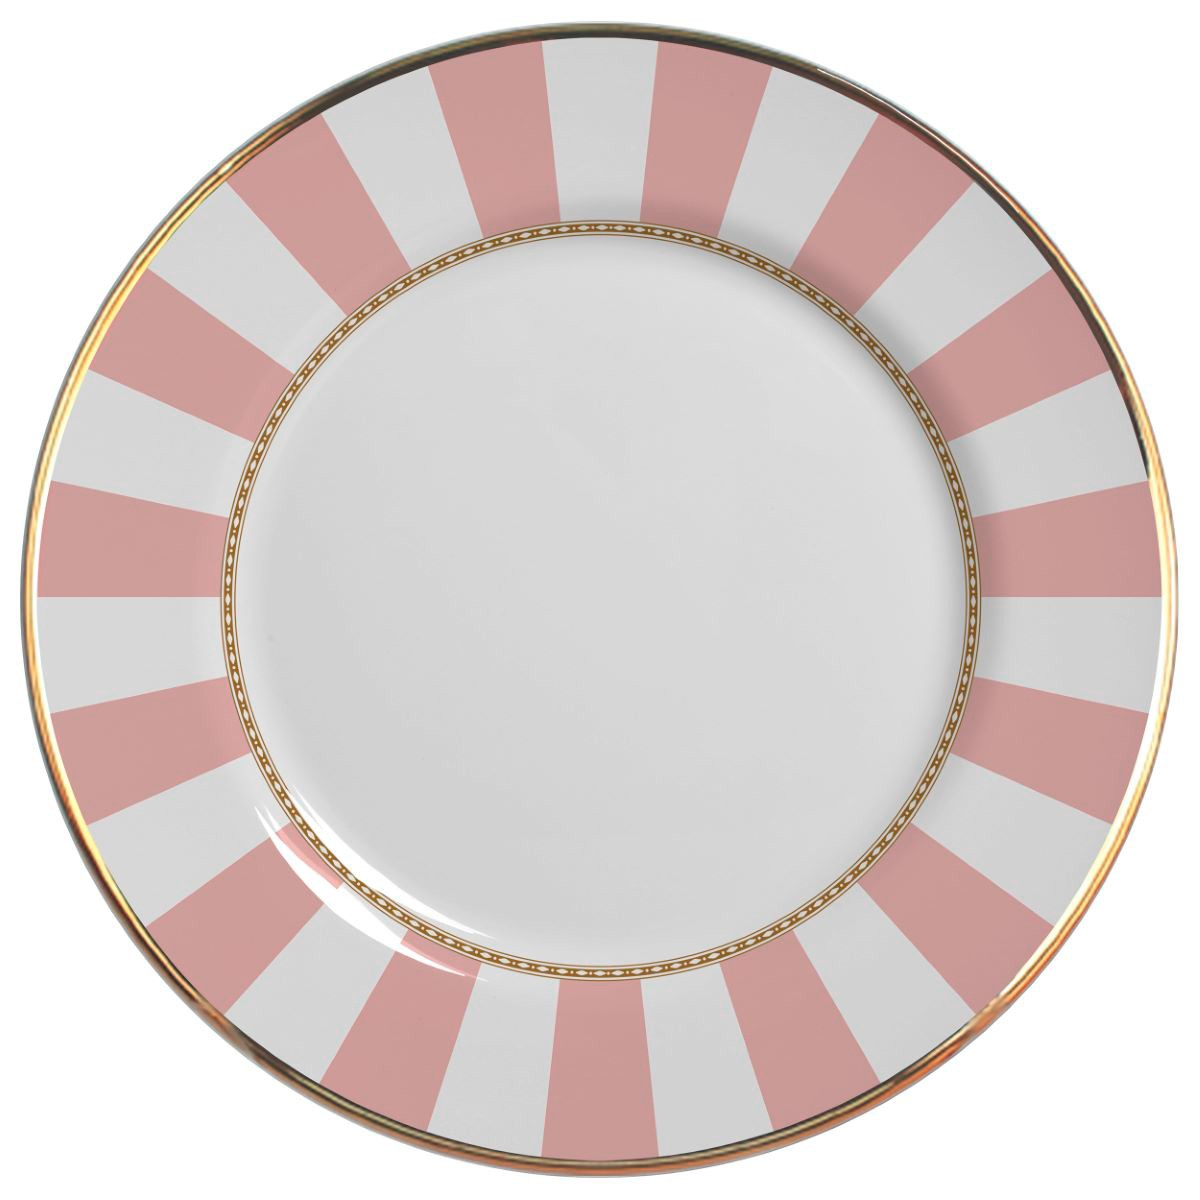 Prato Raso Pink Strip Cerâmica Alleanza - 6 Peças